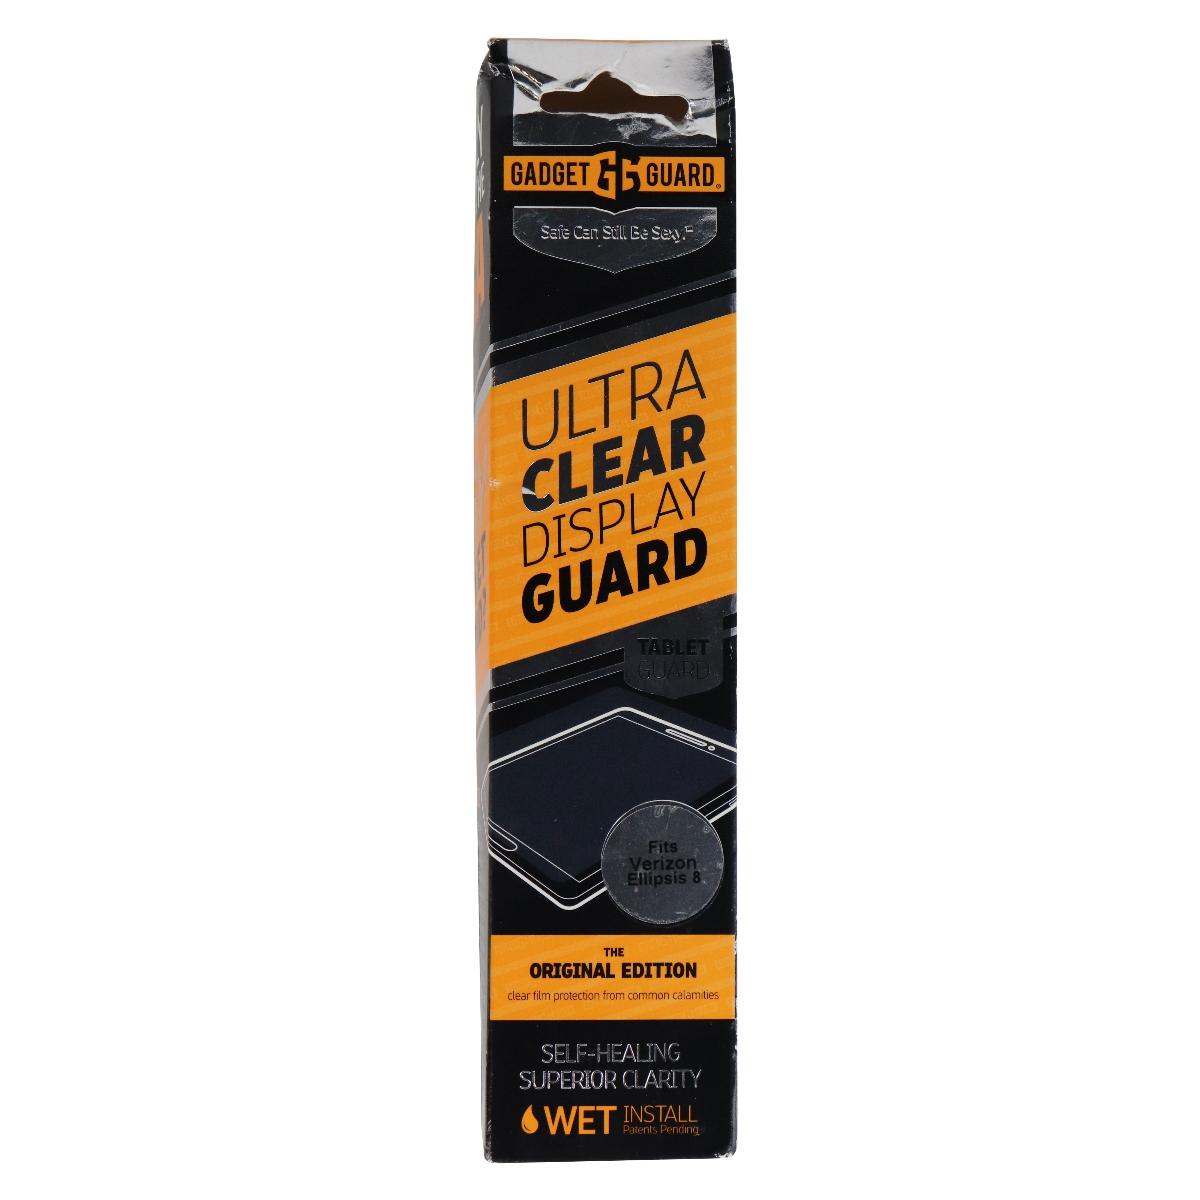 Gadget Guard Original Edition HD Screen Protector for Verizon Ellipsis 8 - Clear